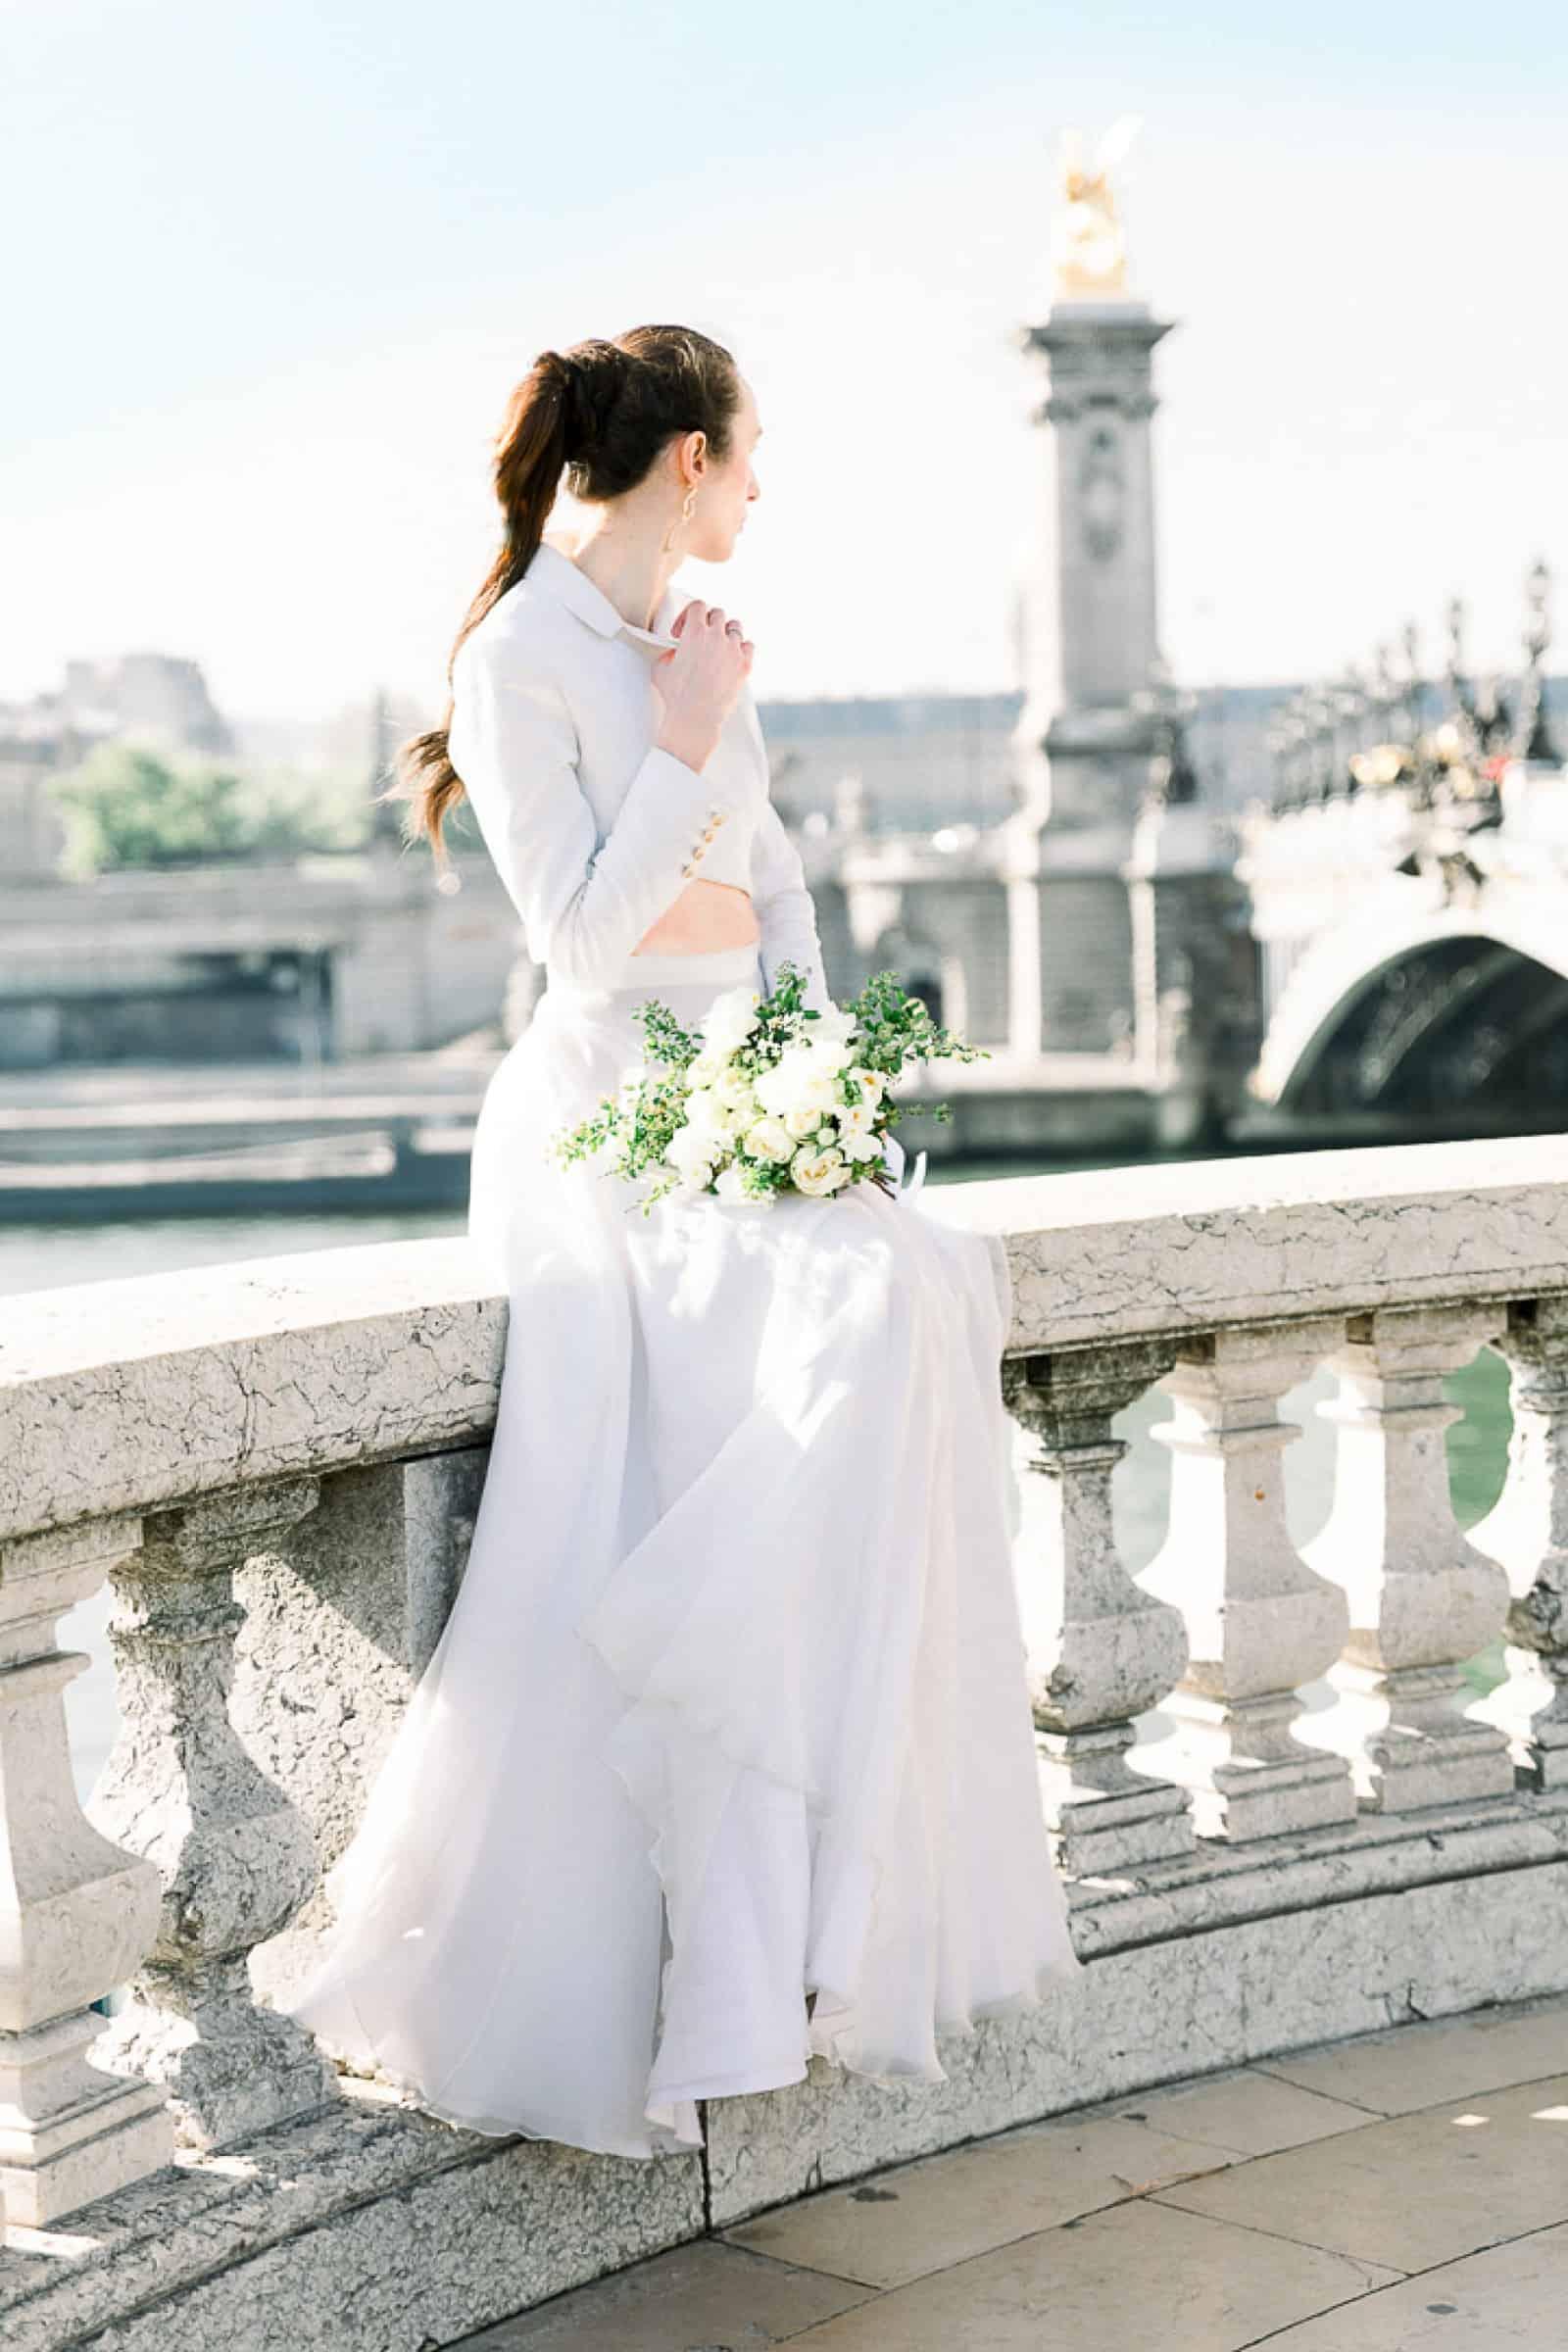 Modern high fashion bride in Paris, France at Pont Alexandre III bridge